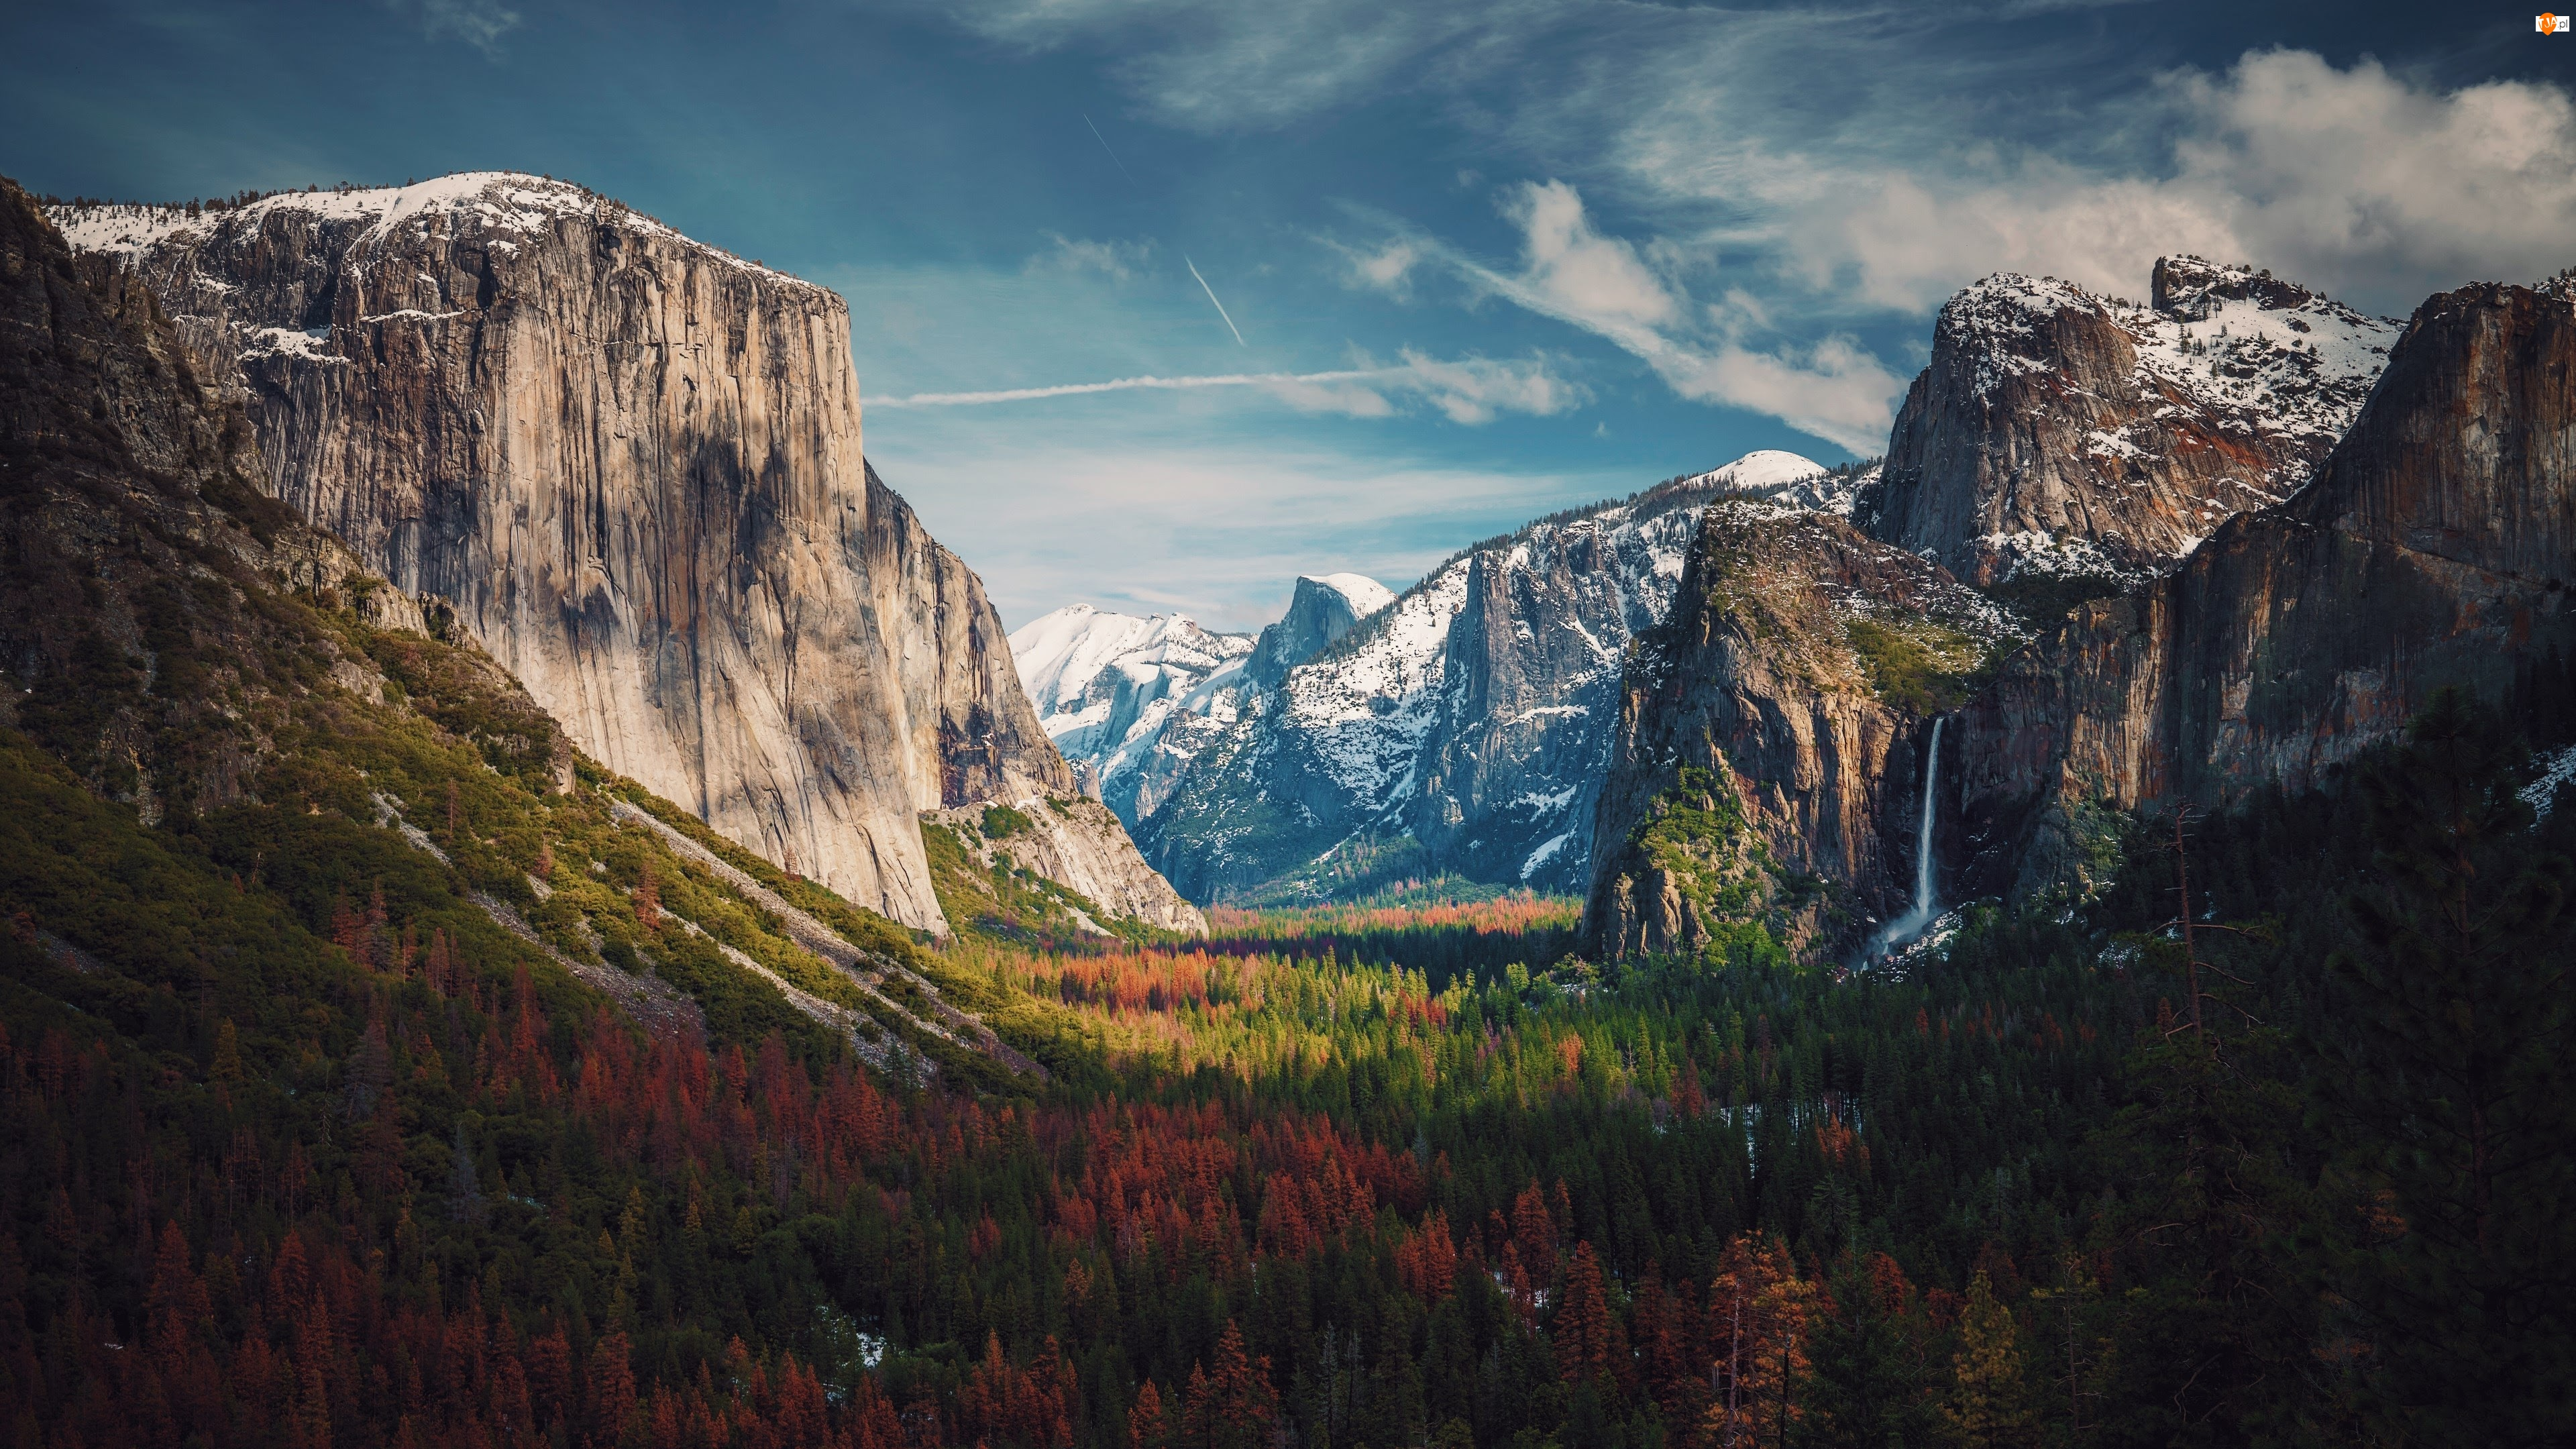 Góry, Stany Zjednoczone, Park Narodowy Yosemite, Stan Kalifornia, Dolina Yosemite Valley